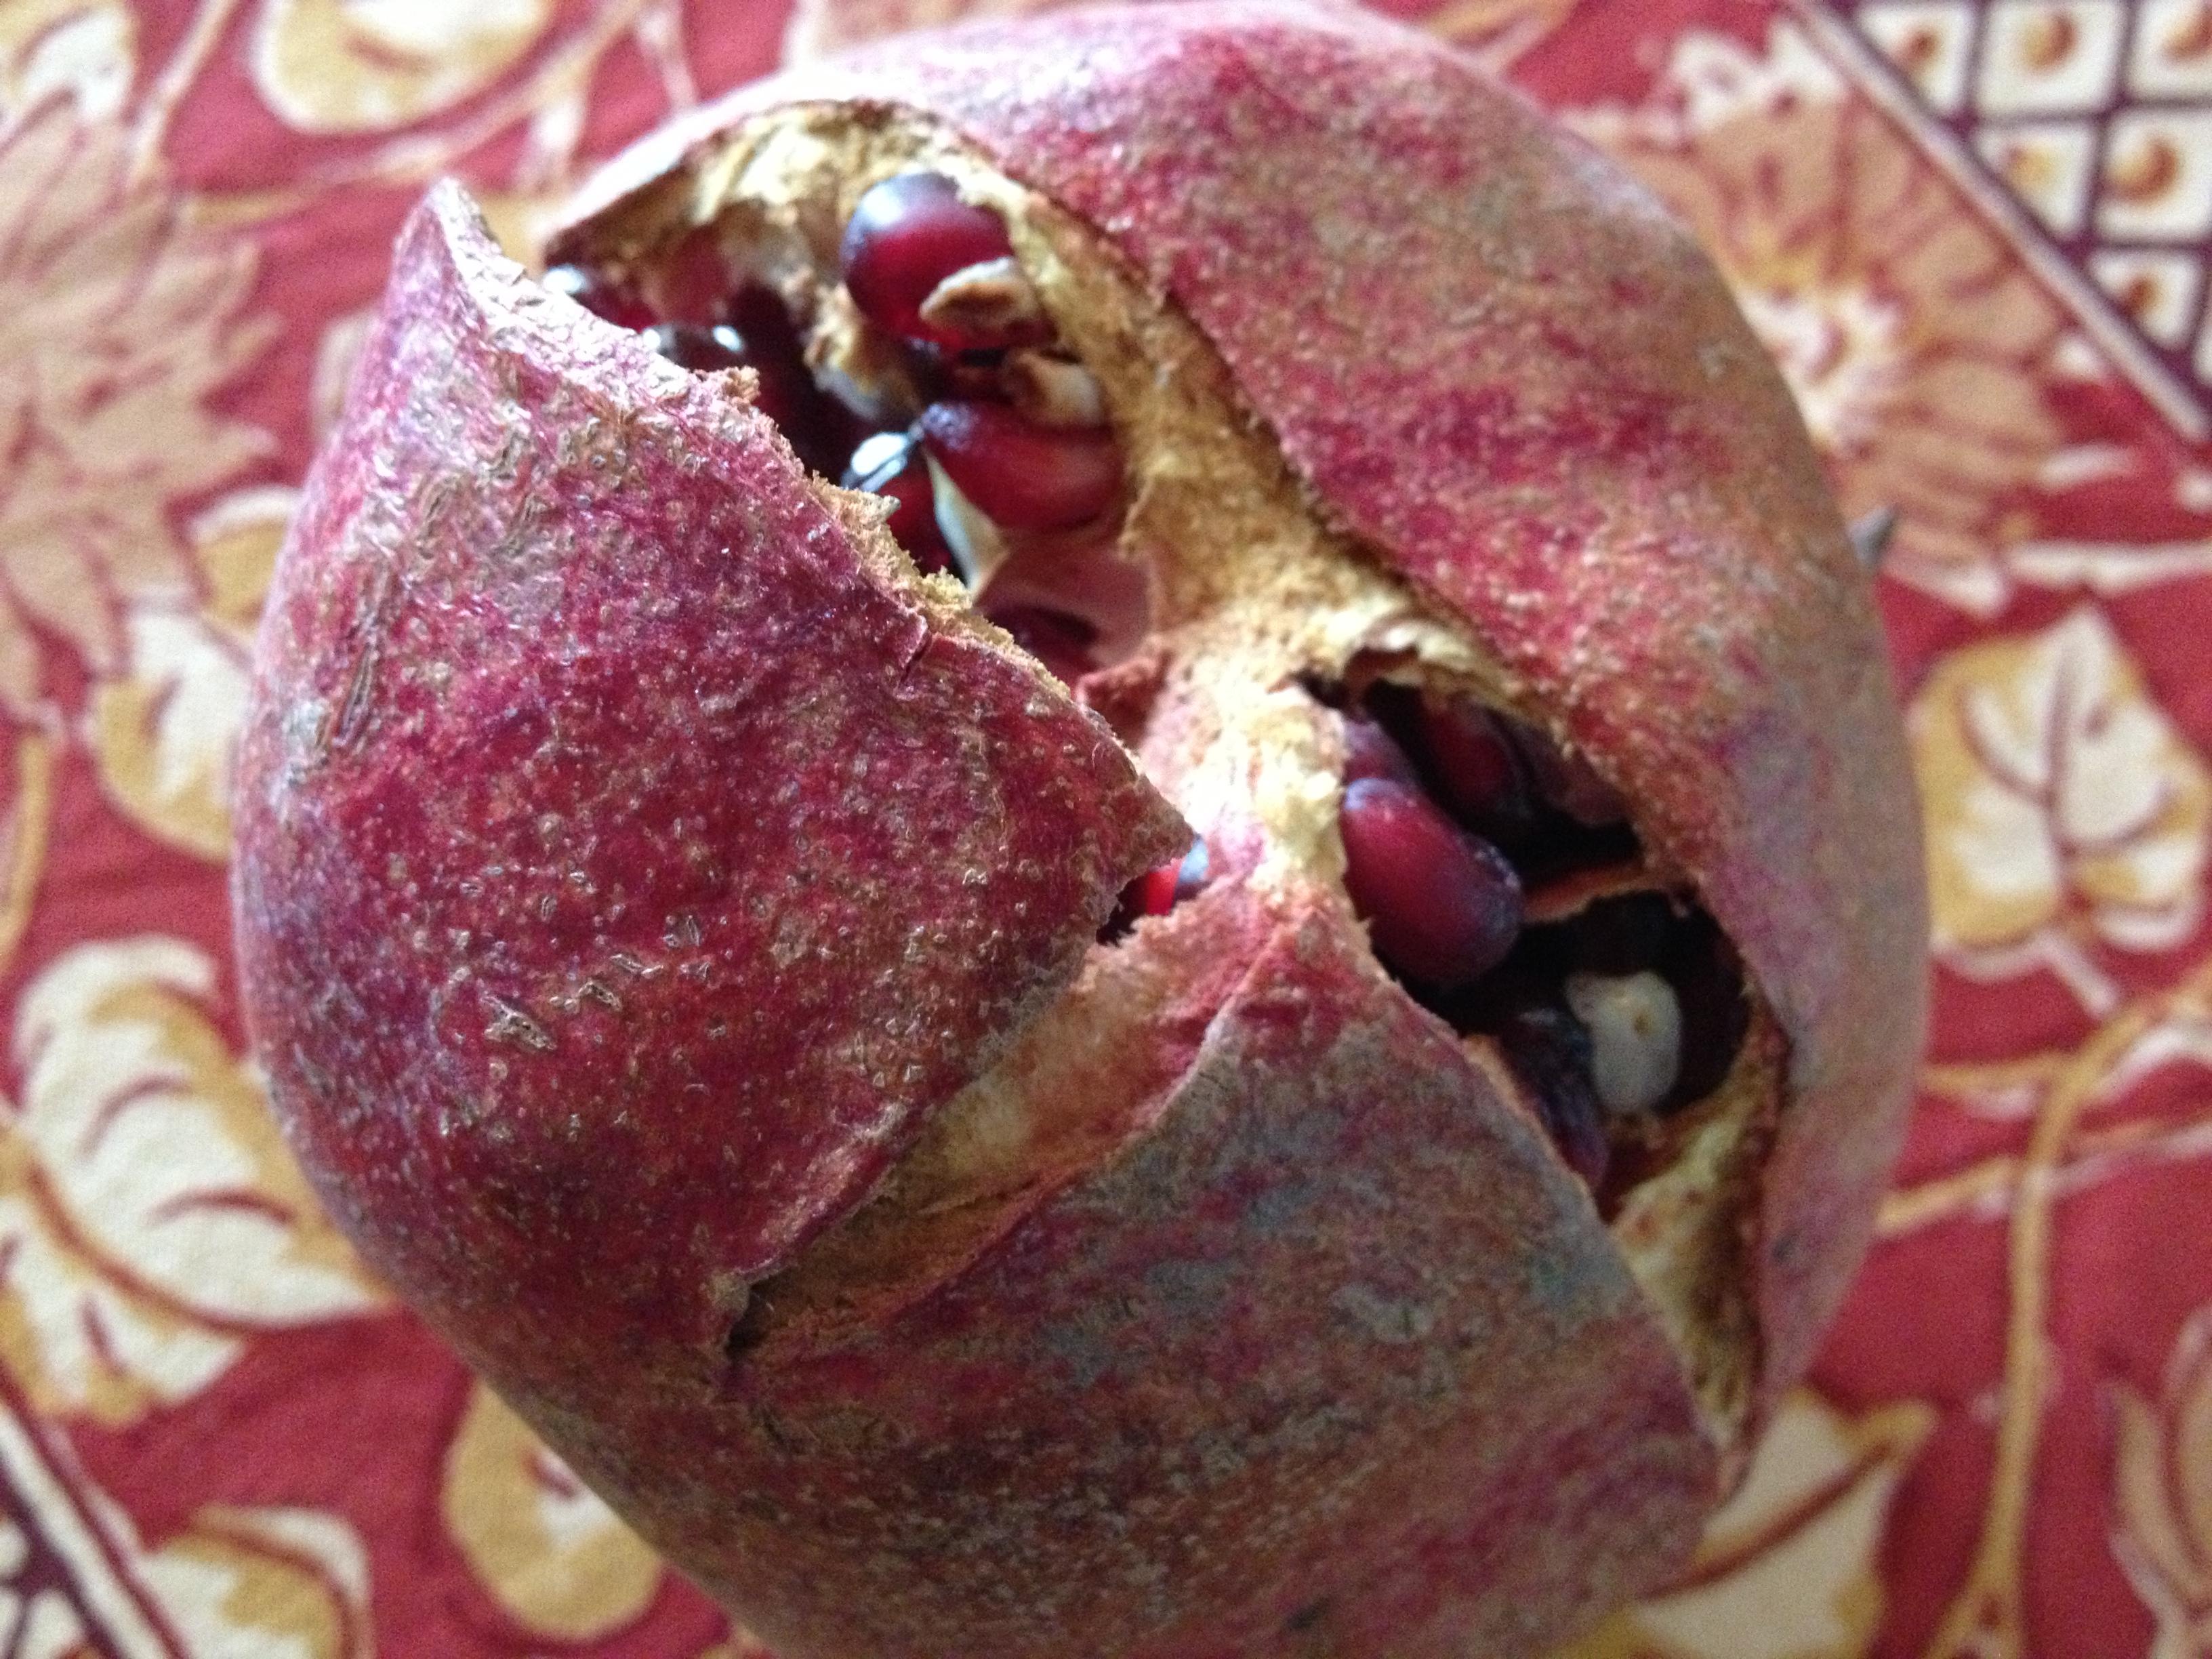 Food Photo Pomegranate 001